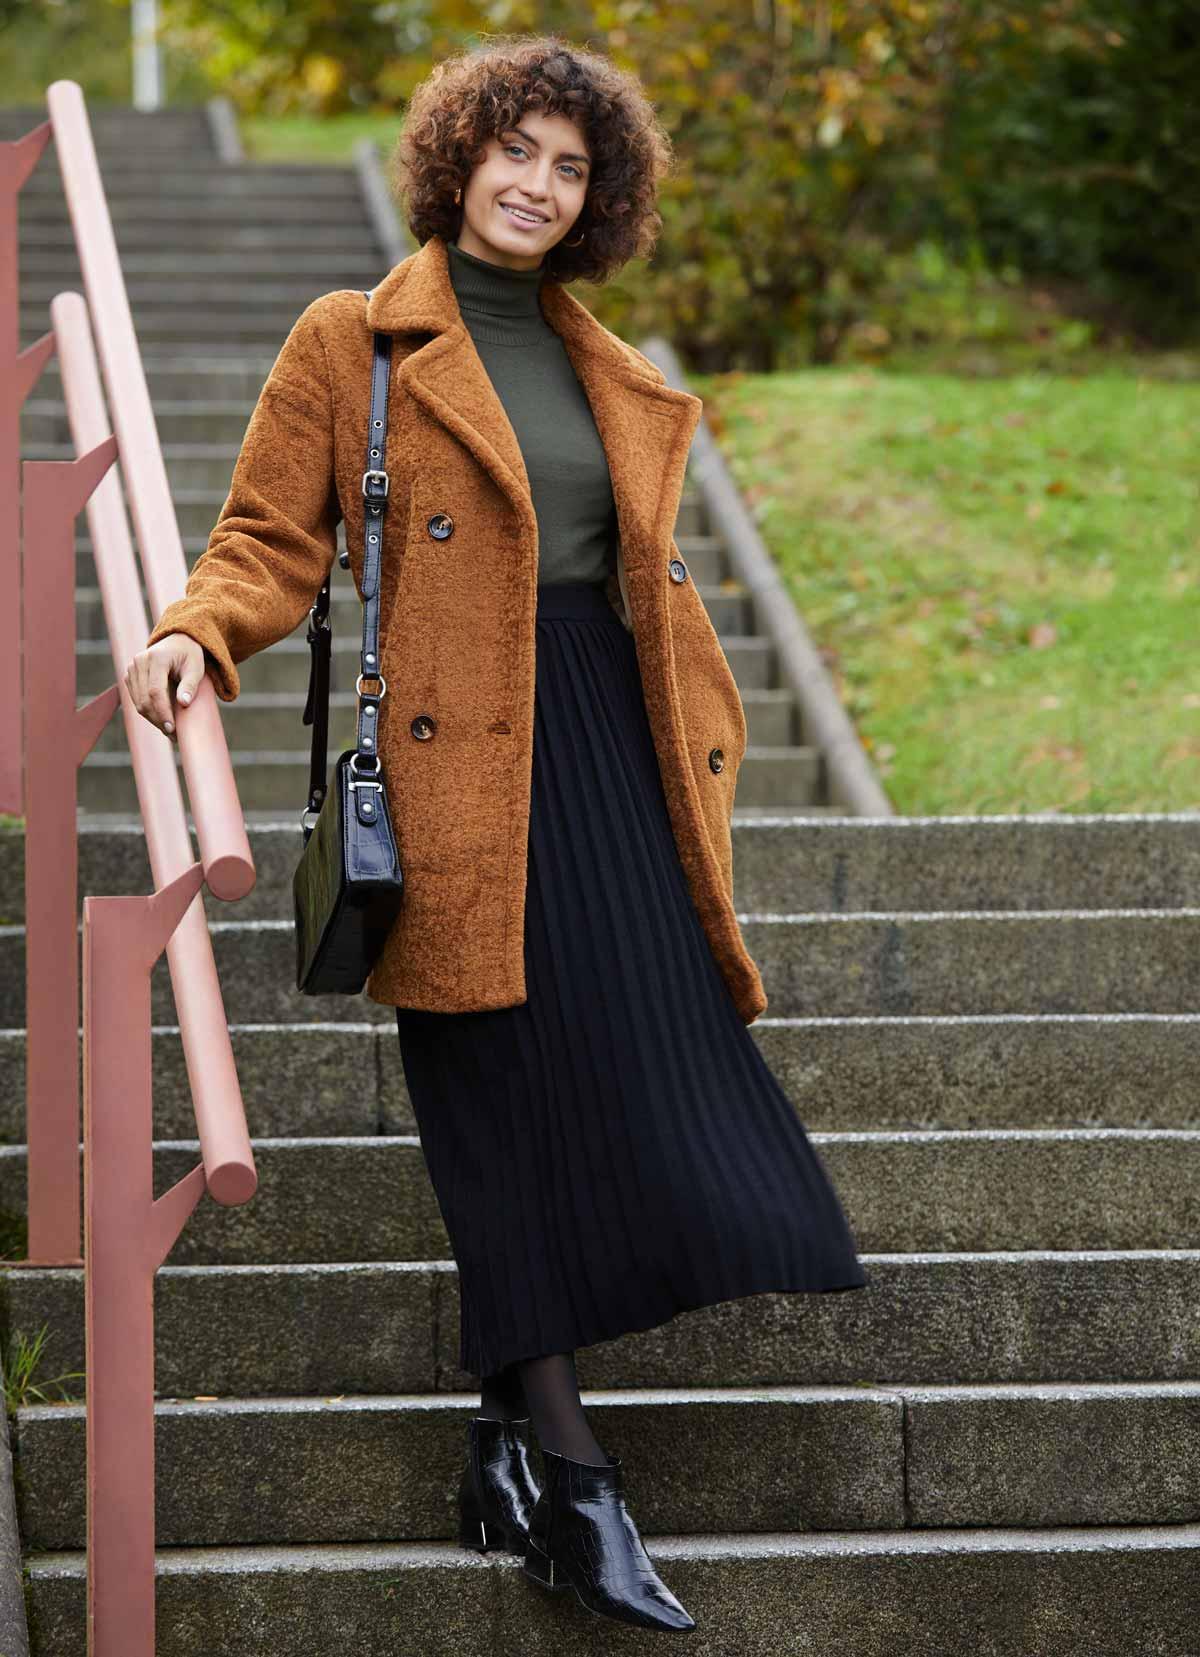 outfit abrigo peluche marrón